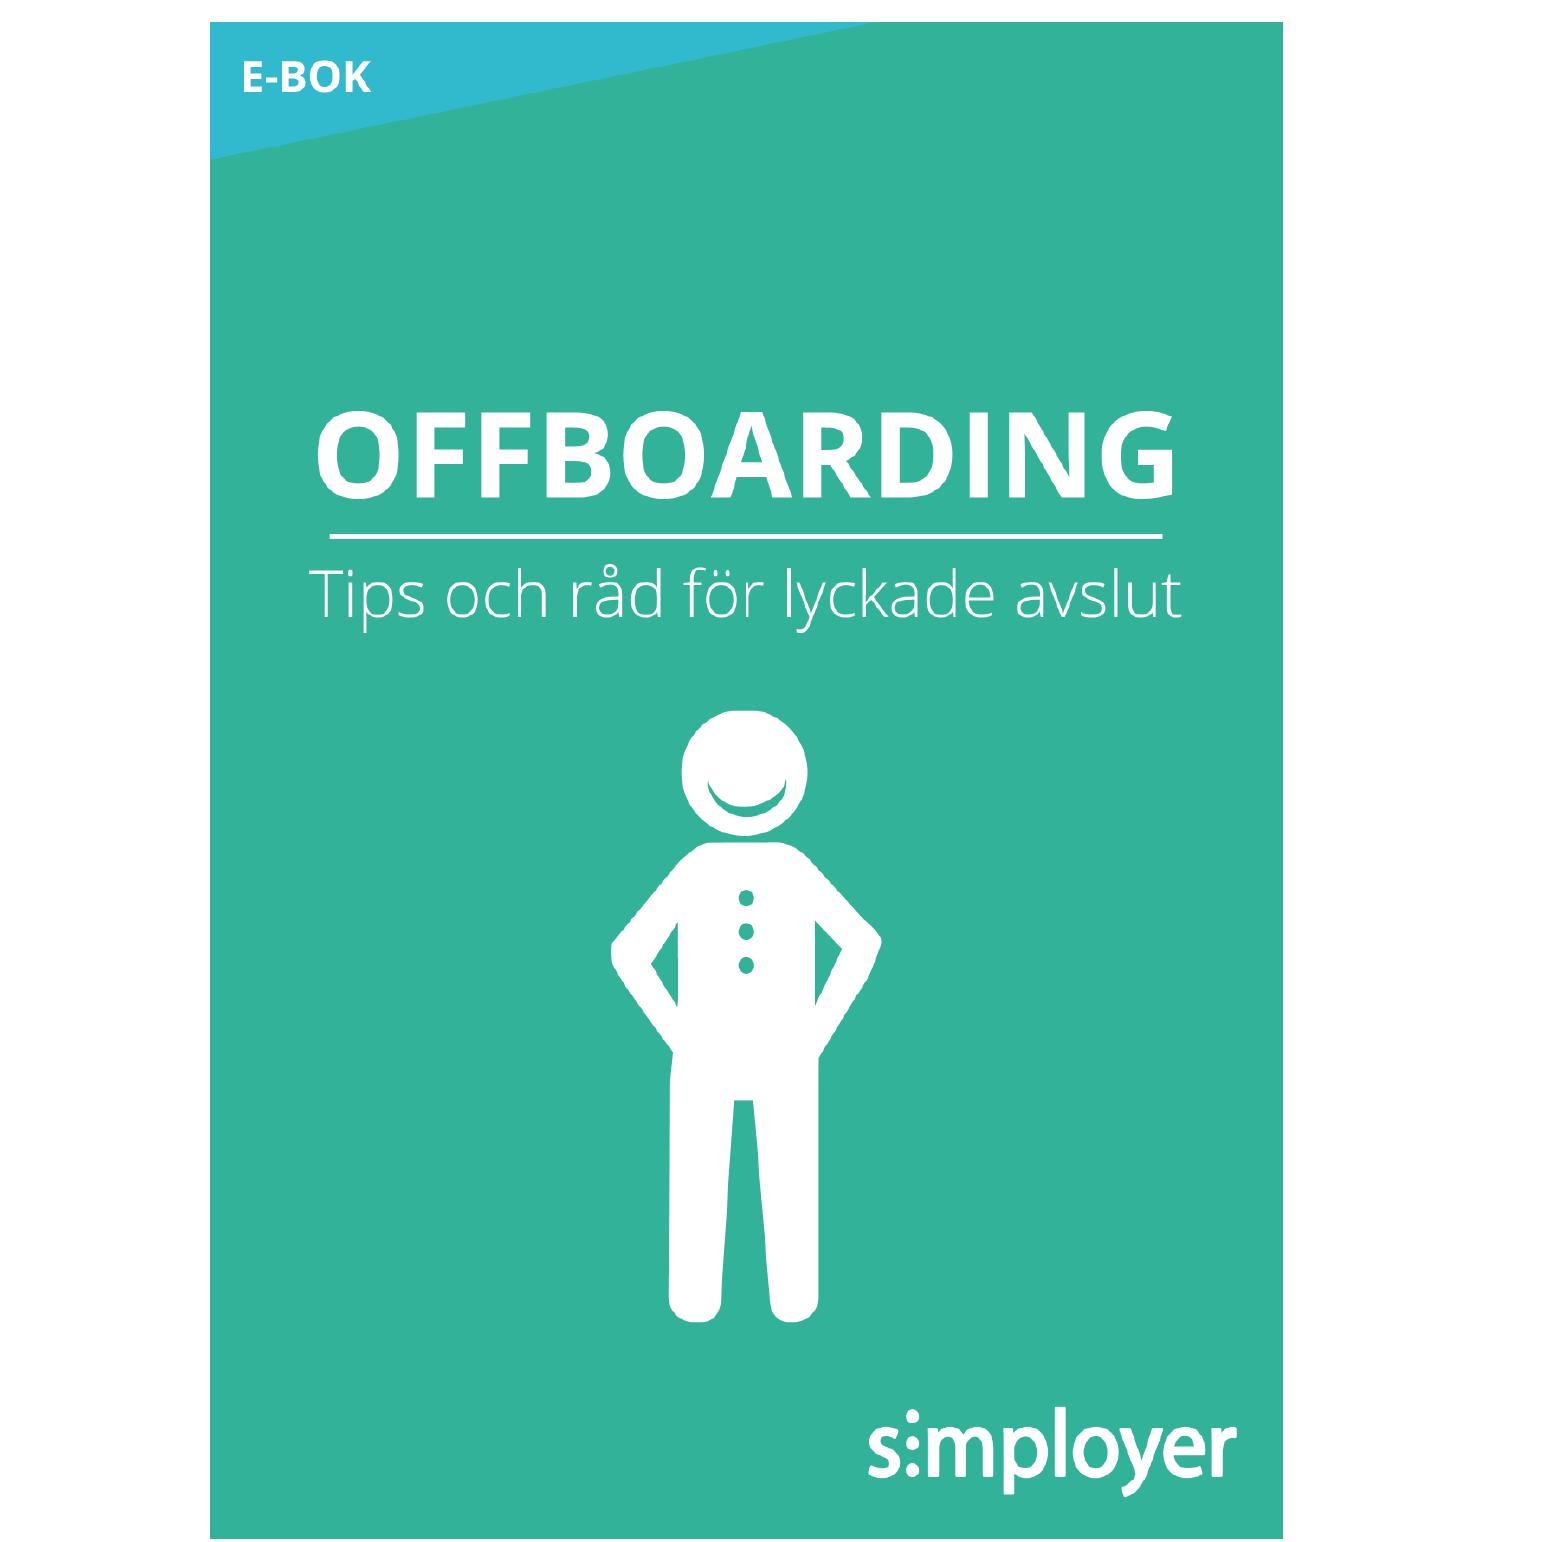 E-boken Offboarding från Simployer